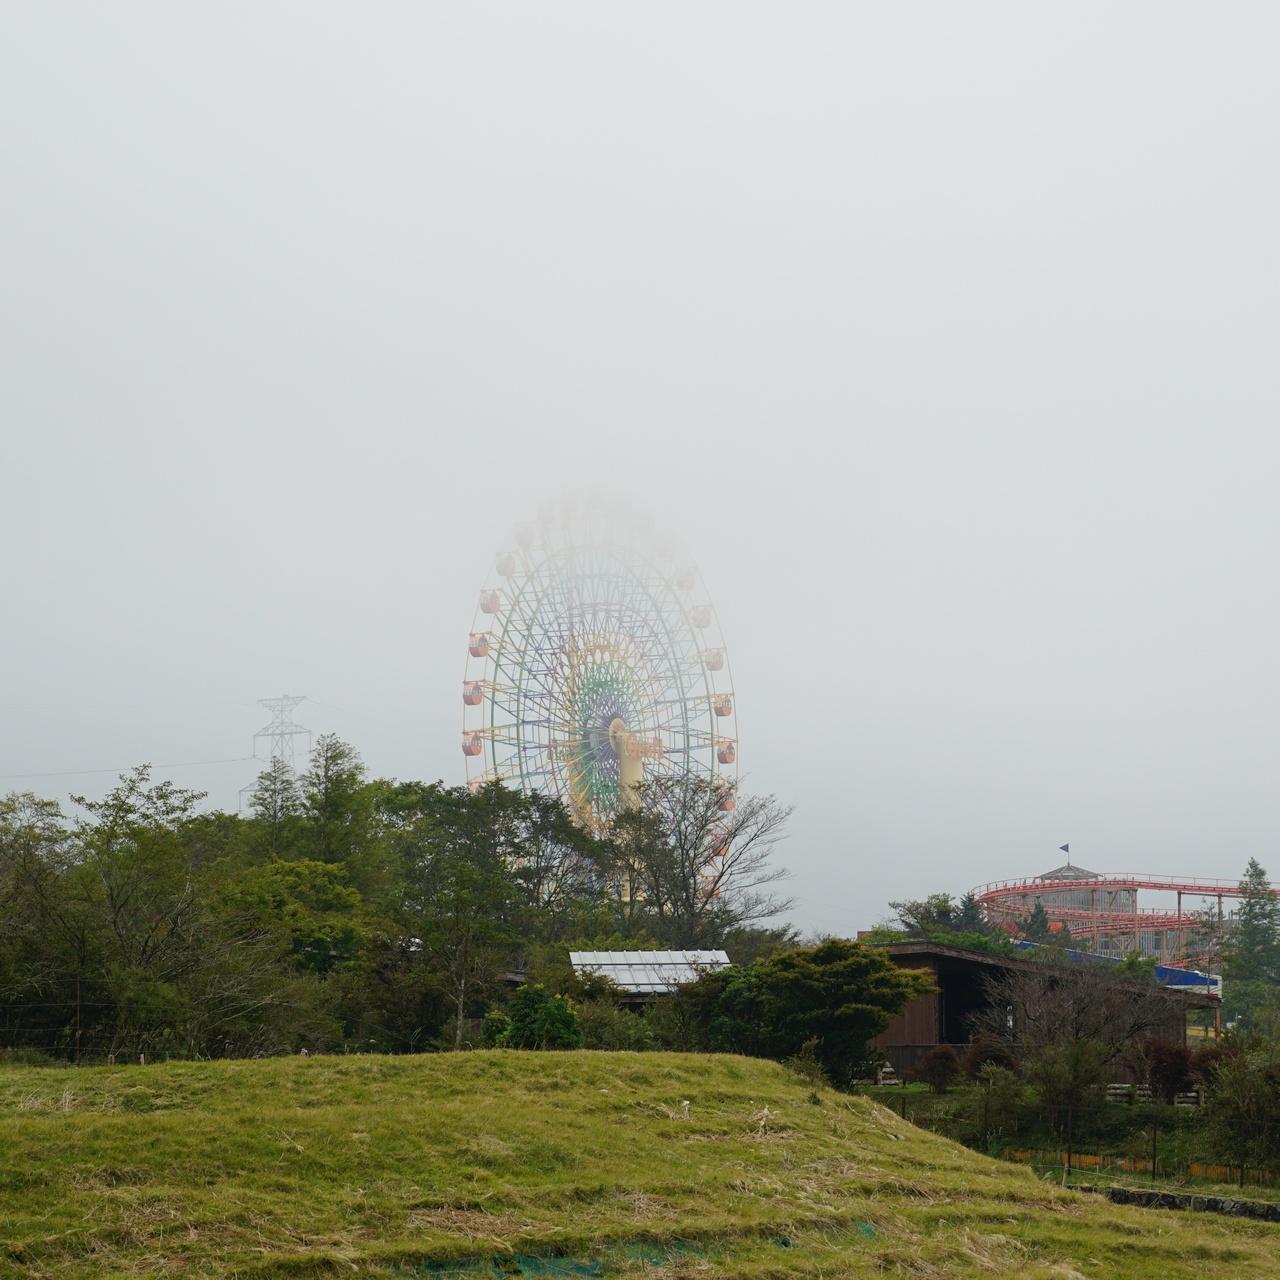 the 絶景花火天候は曇り